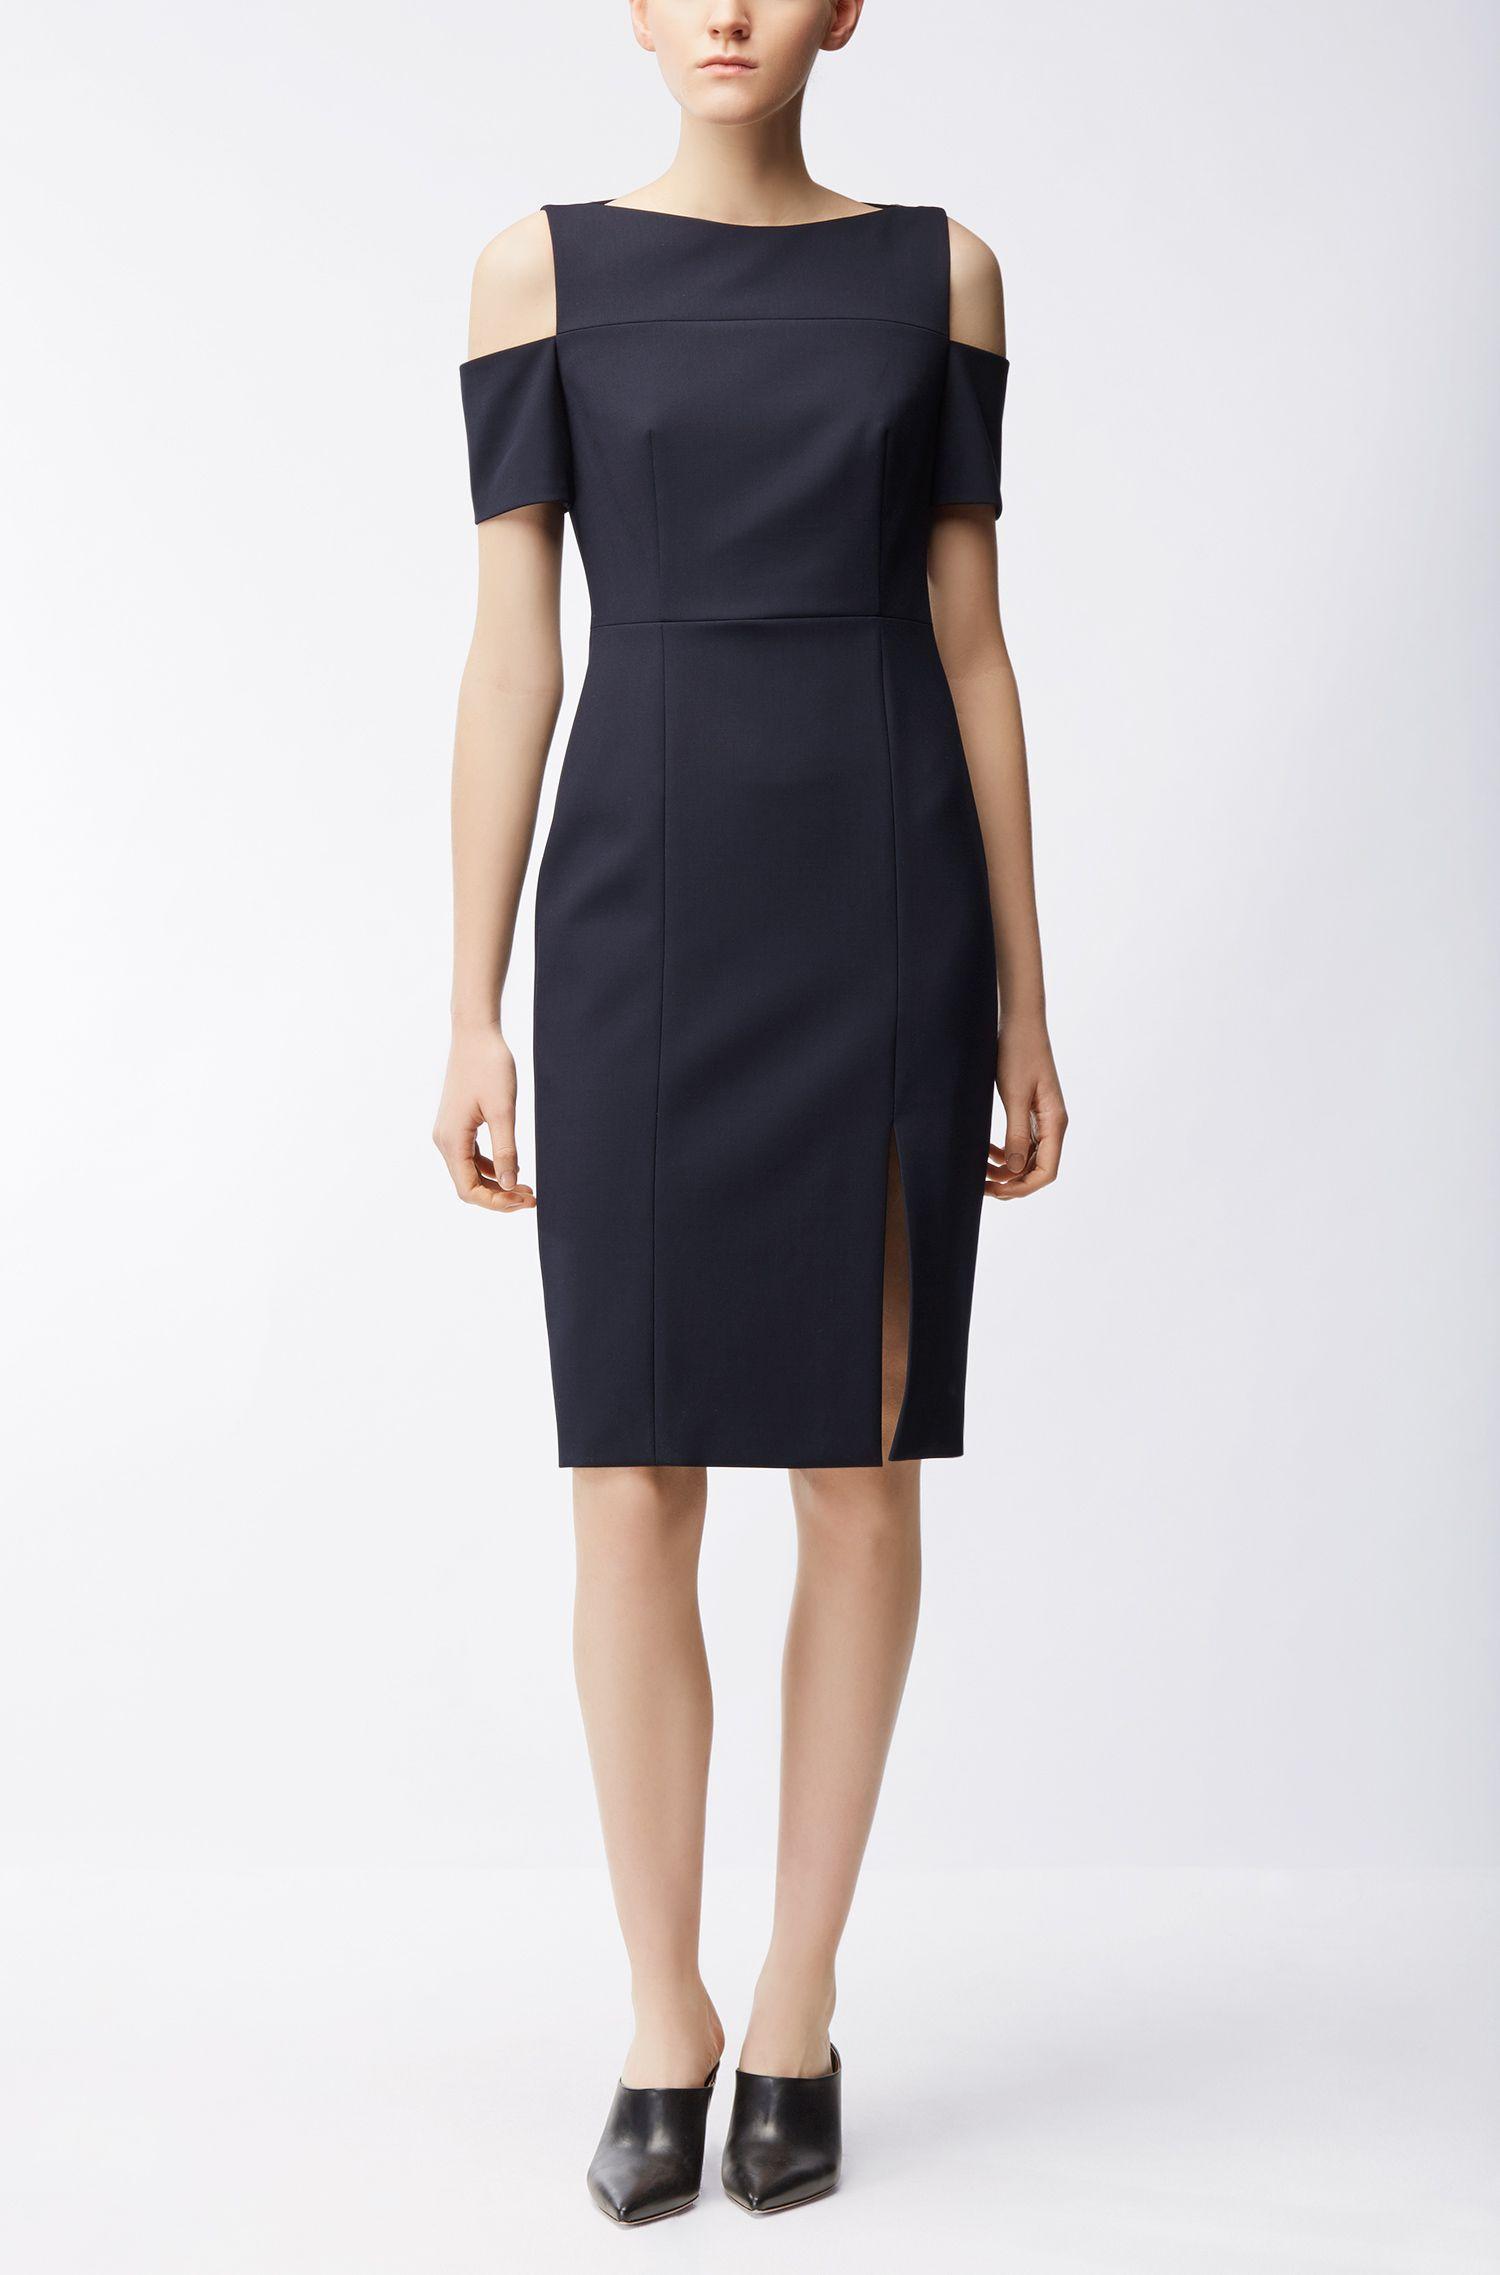 Schouderloze jurk van lichte crêpe